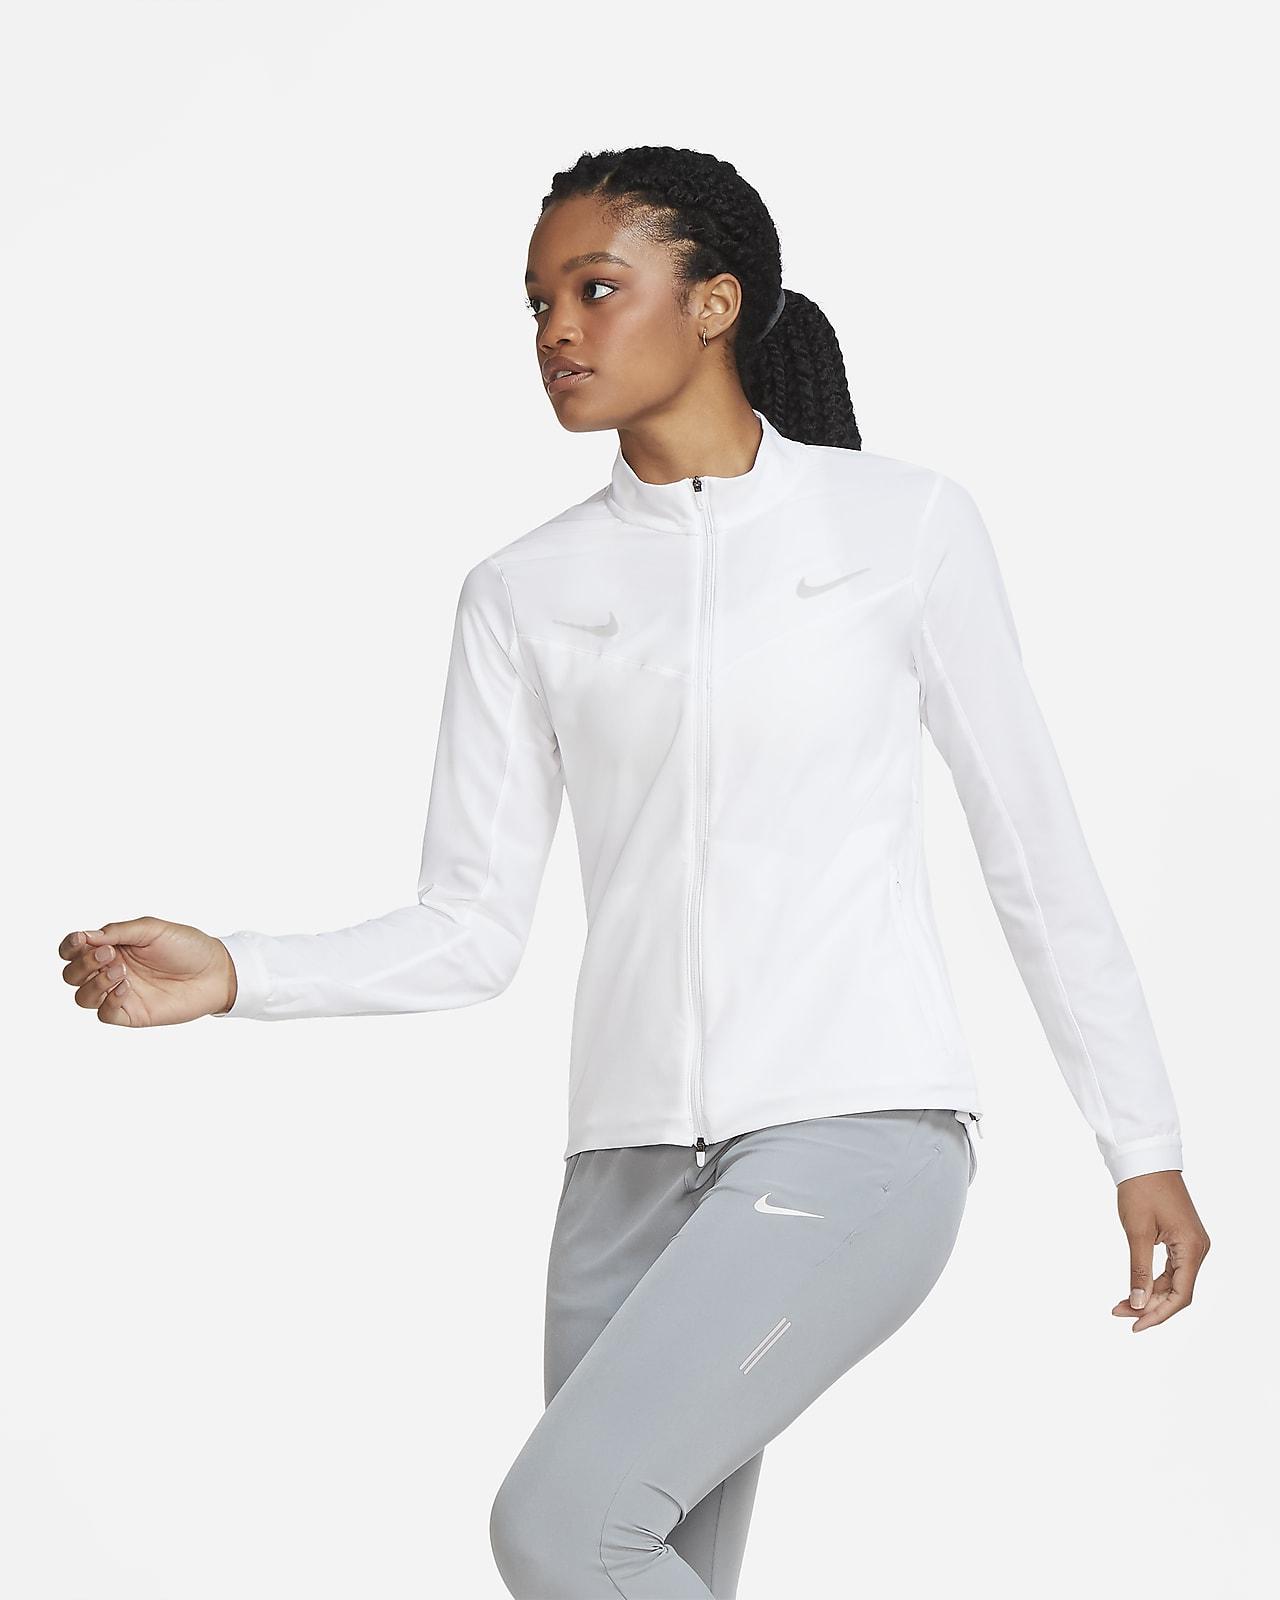 Nike Women's Running Jacket